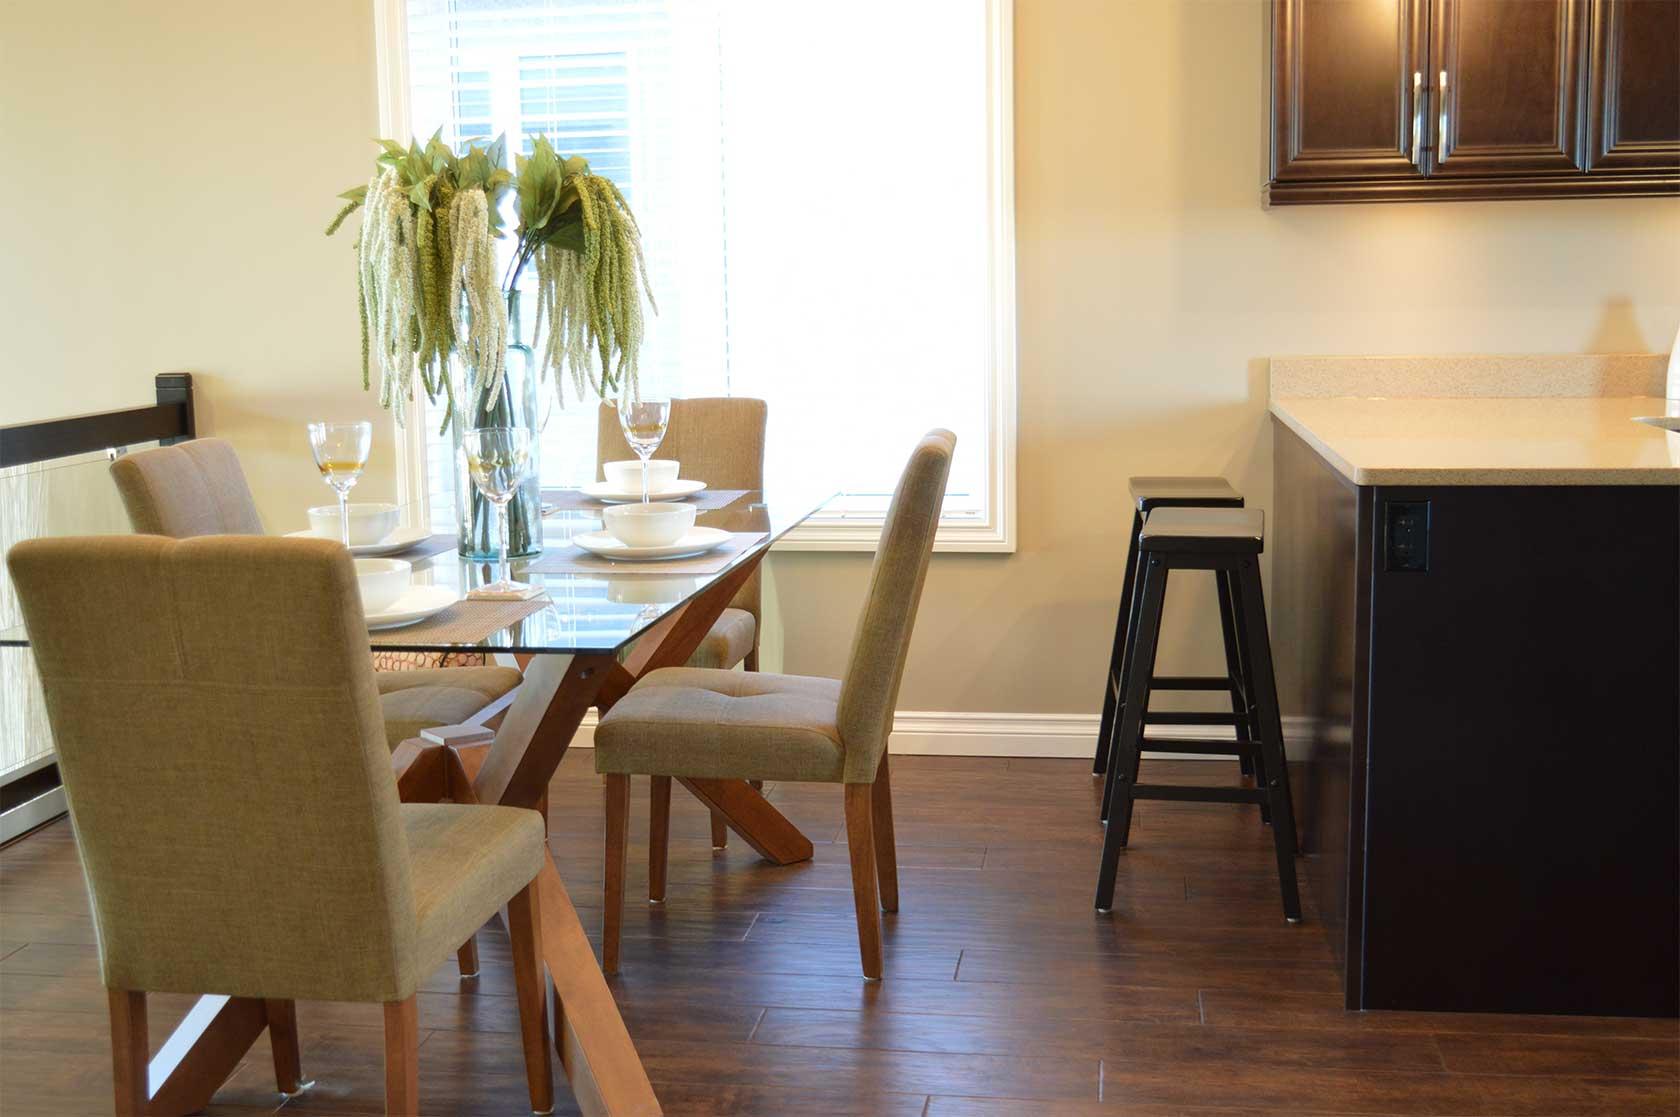 Table Wood House Floor Interior